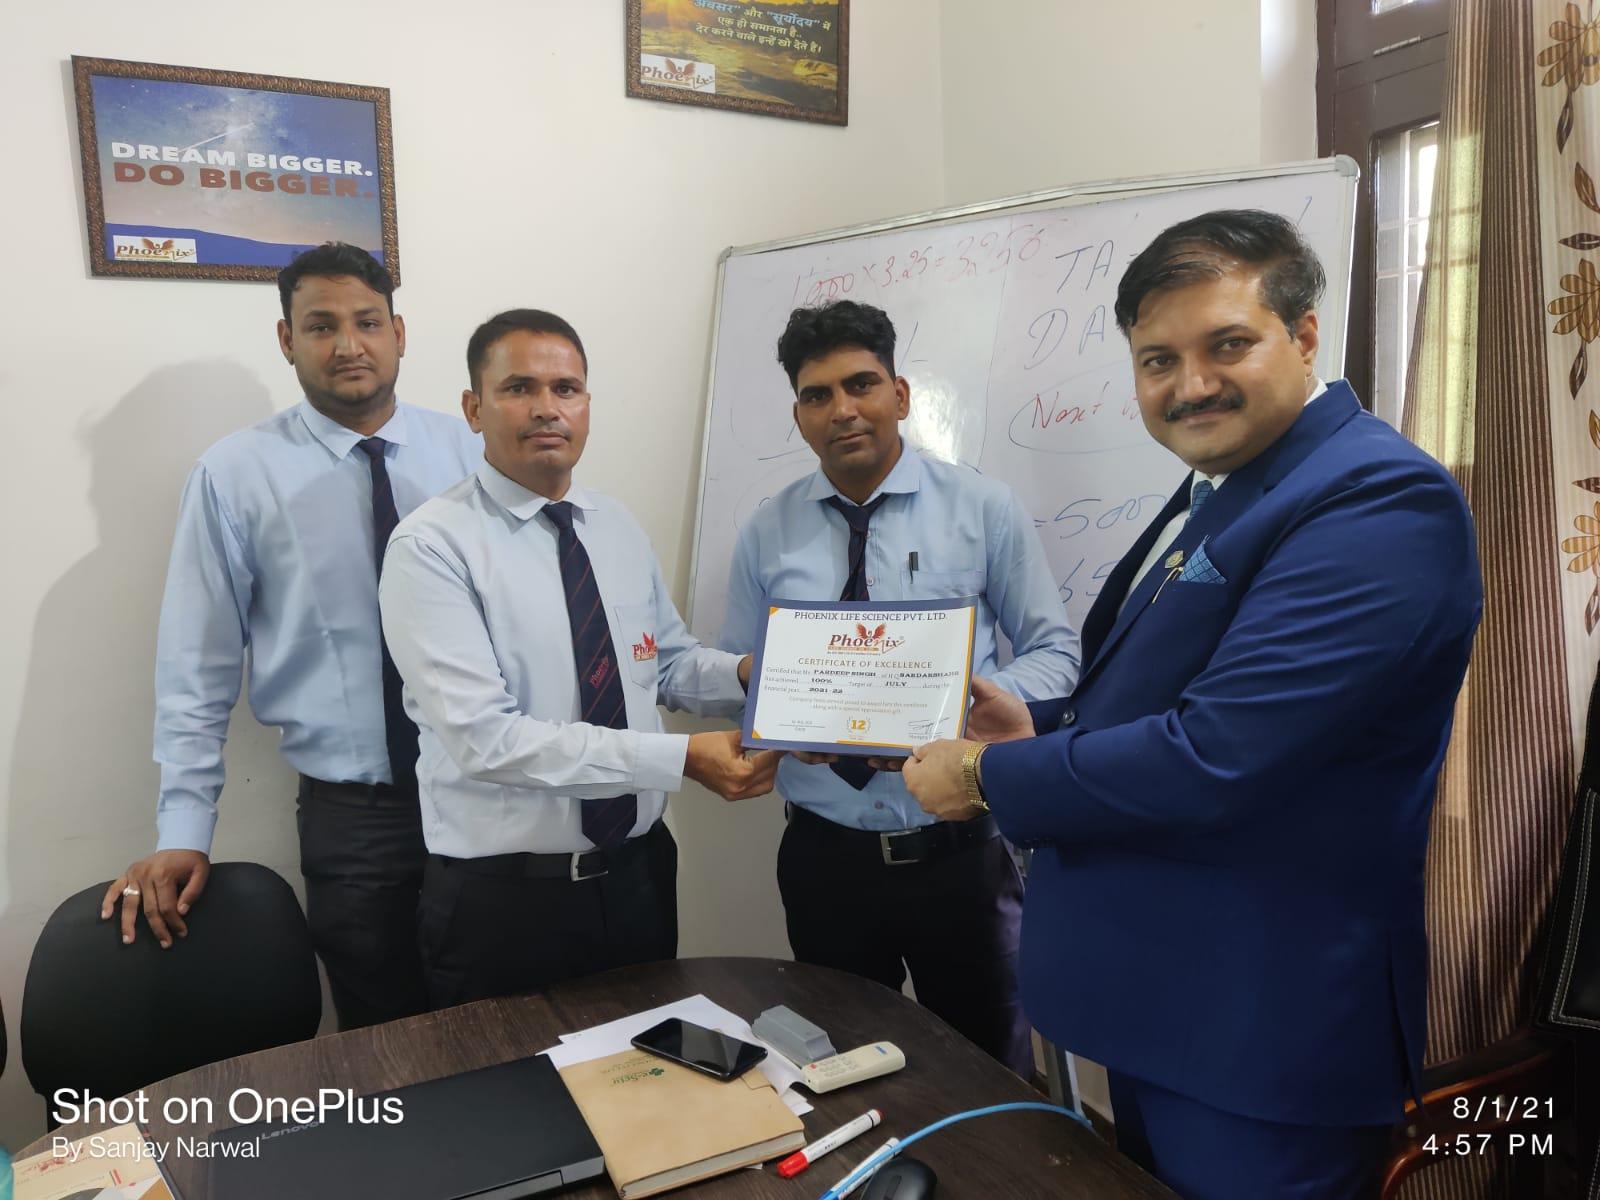 Pardeep Singh Sarsahar Achiever awarded by Dr. Sanjay Narwal, MD, Phoenix Life Science Pvt. Ltd.